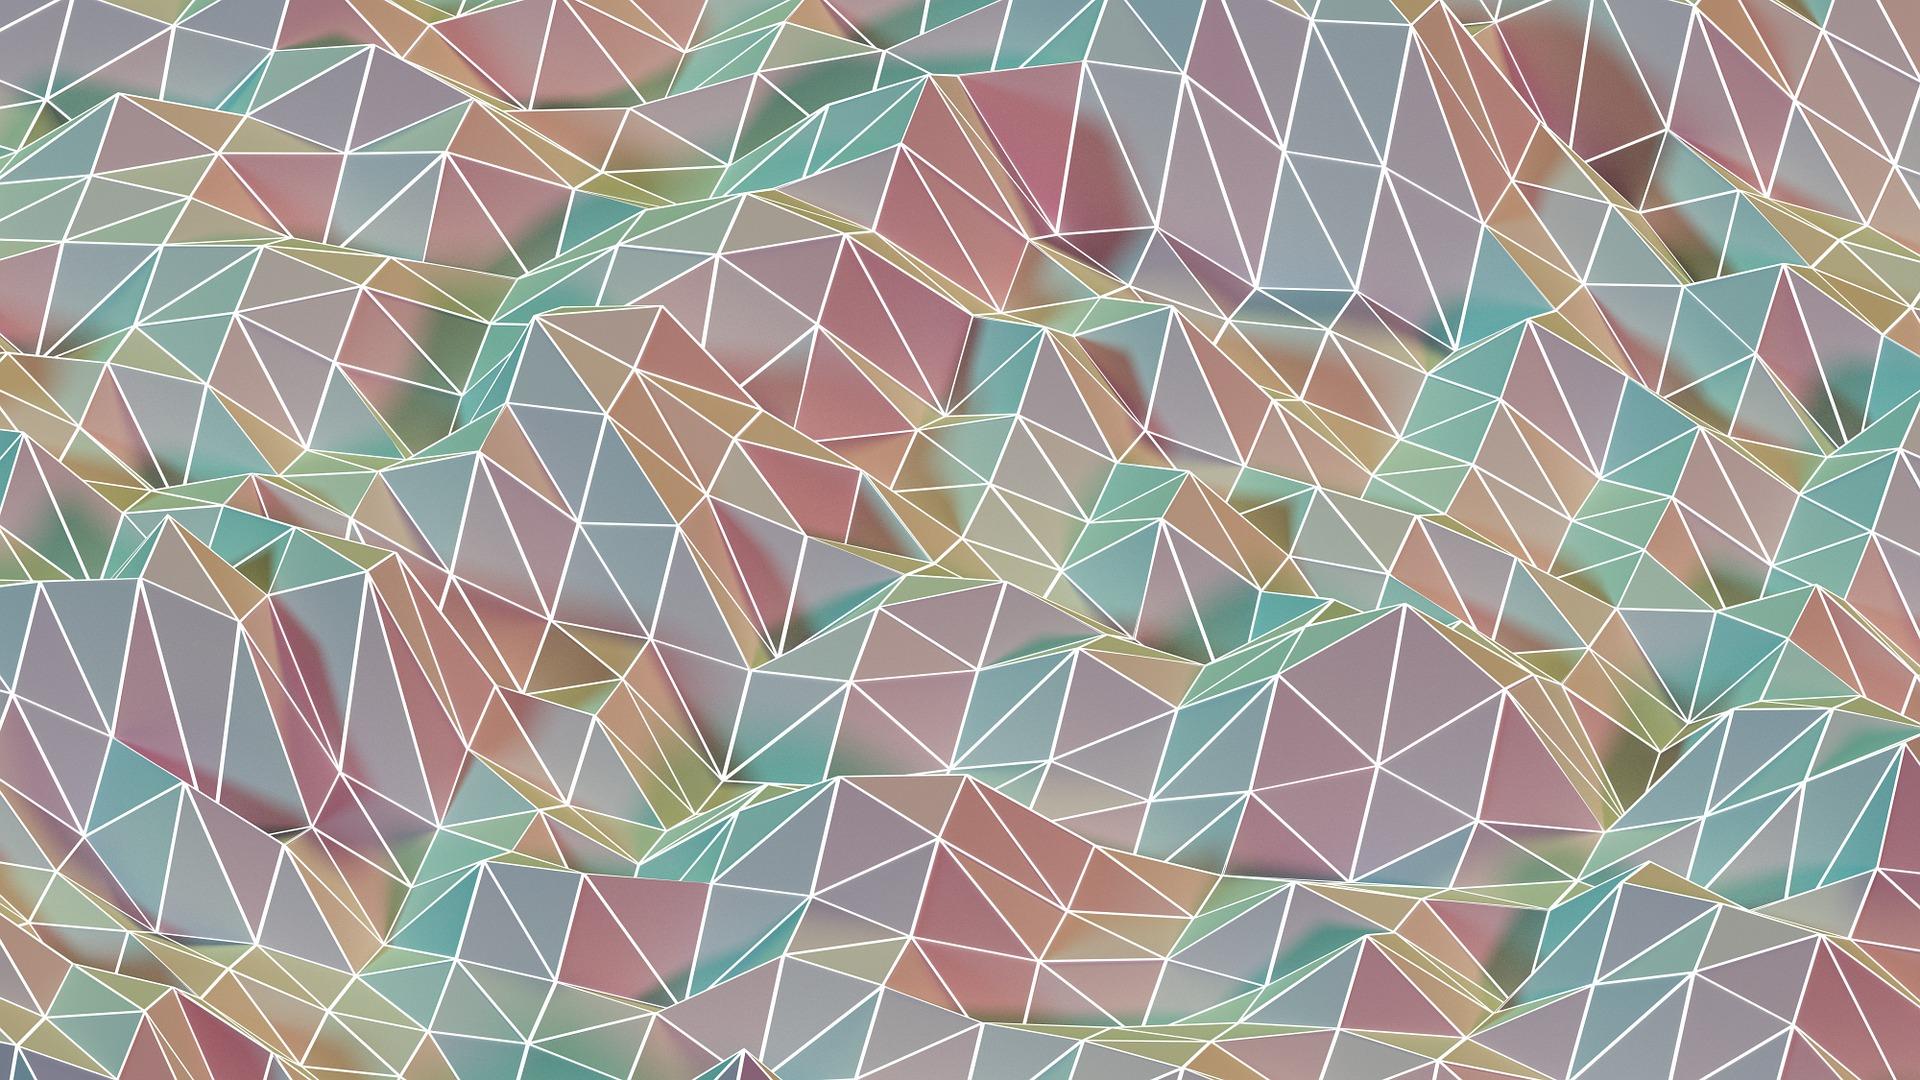 रूपों, रंग, सतह, त्रिकोण, दुर्लभ - HD वॉलपेपर - प्रोफेसर-falken.com